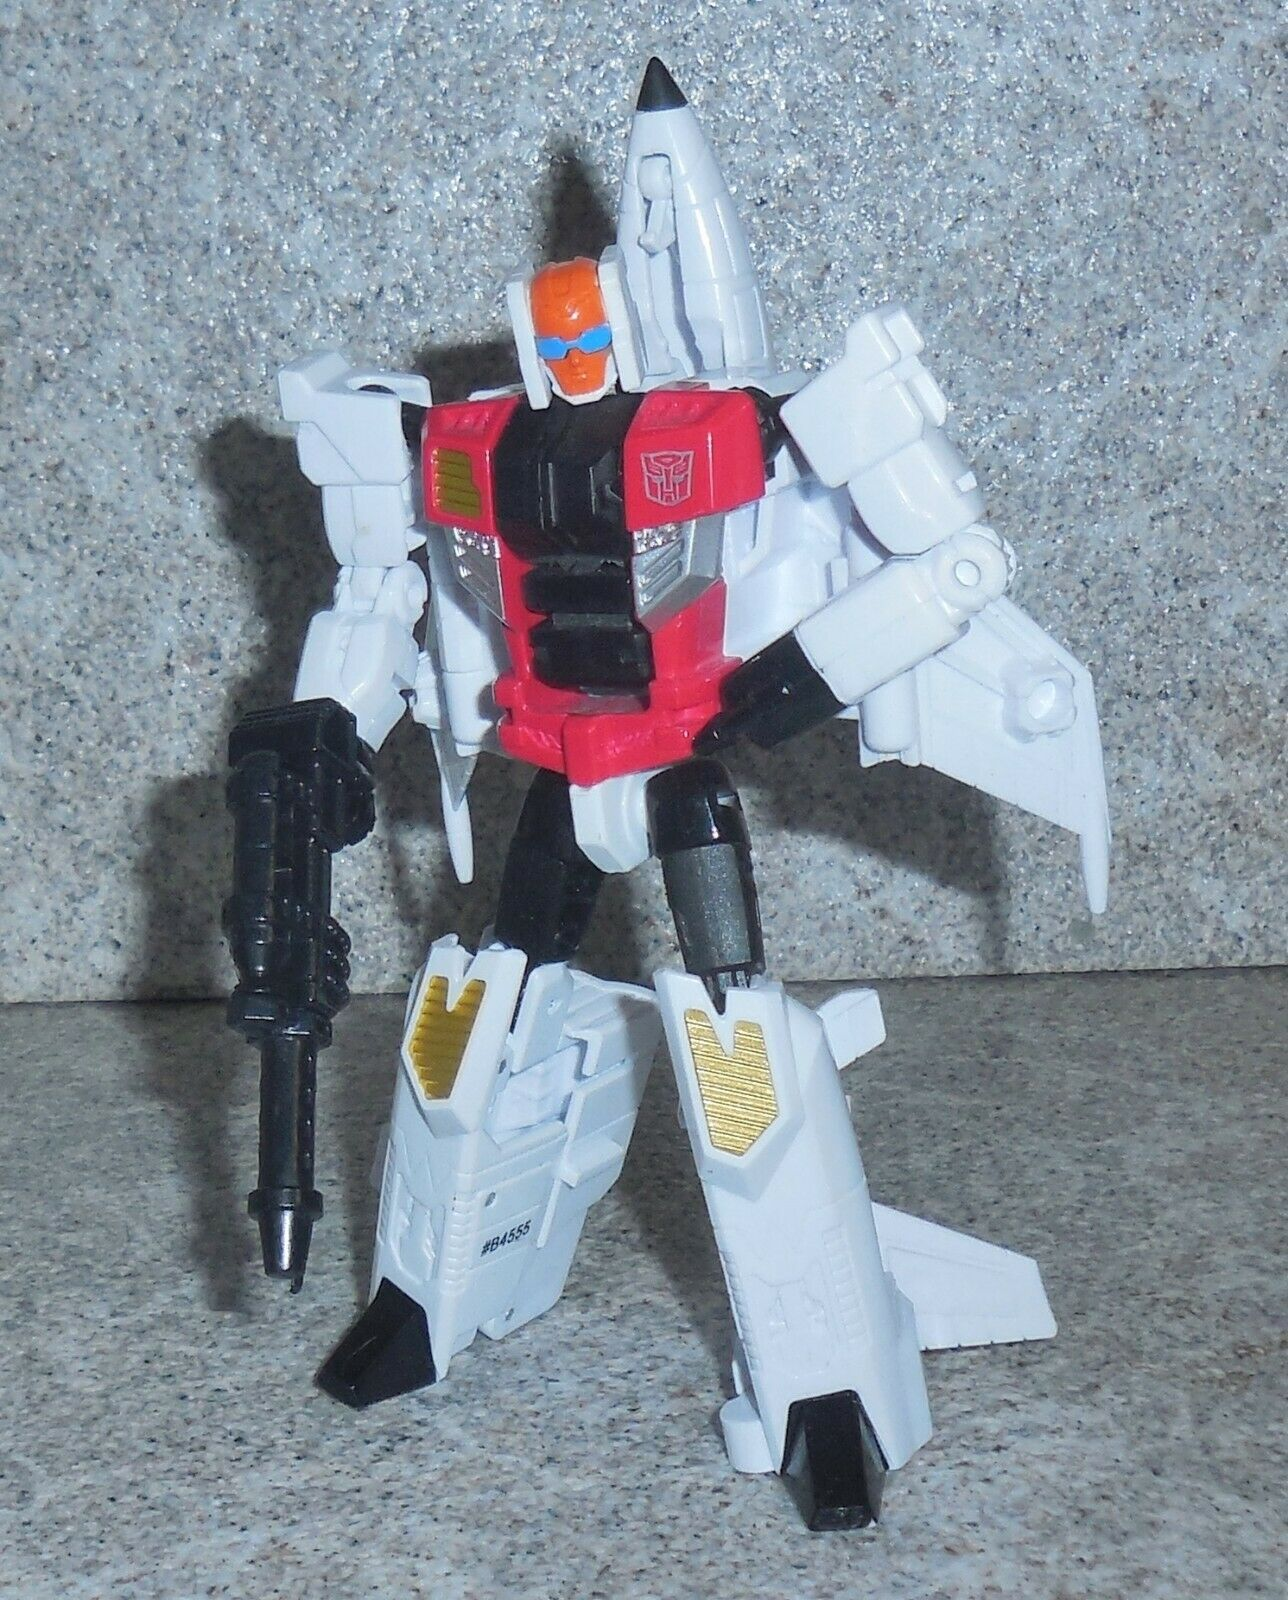 Transformers Combiner Guerre Quickslinger Deluxe Superion